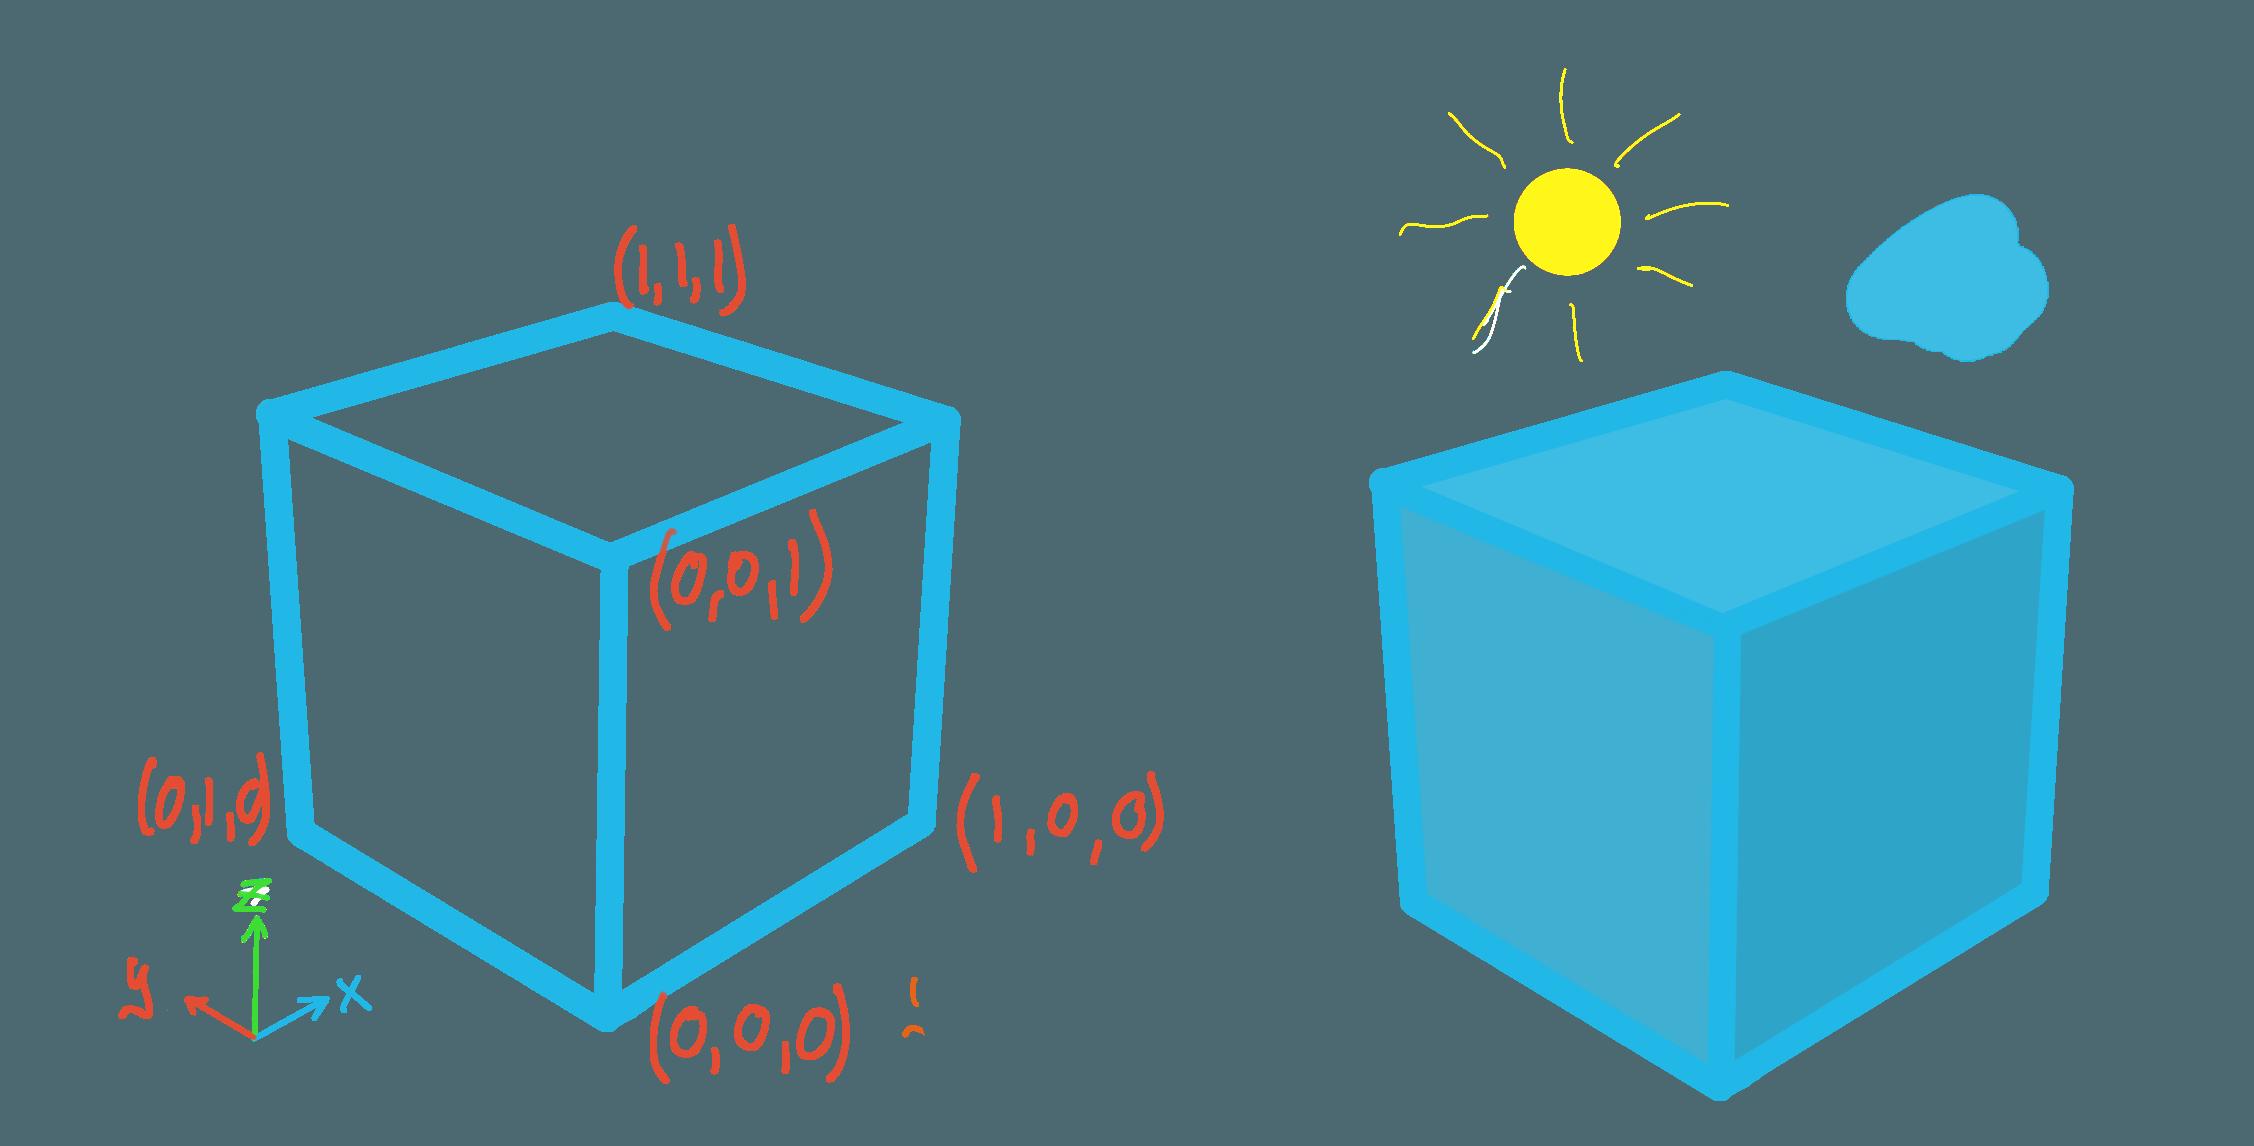 Unity shader example